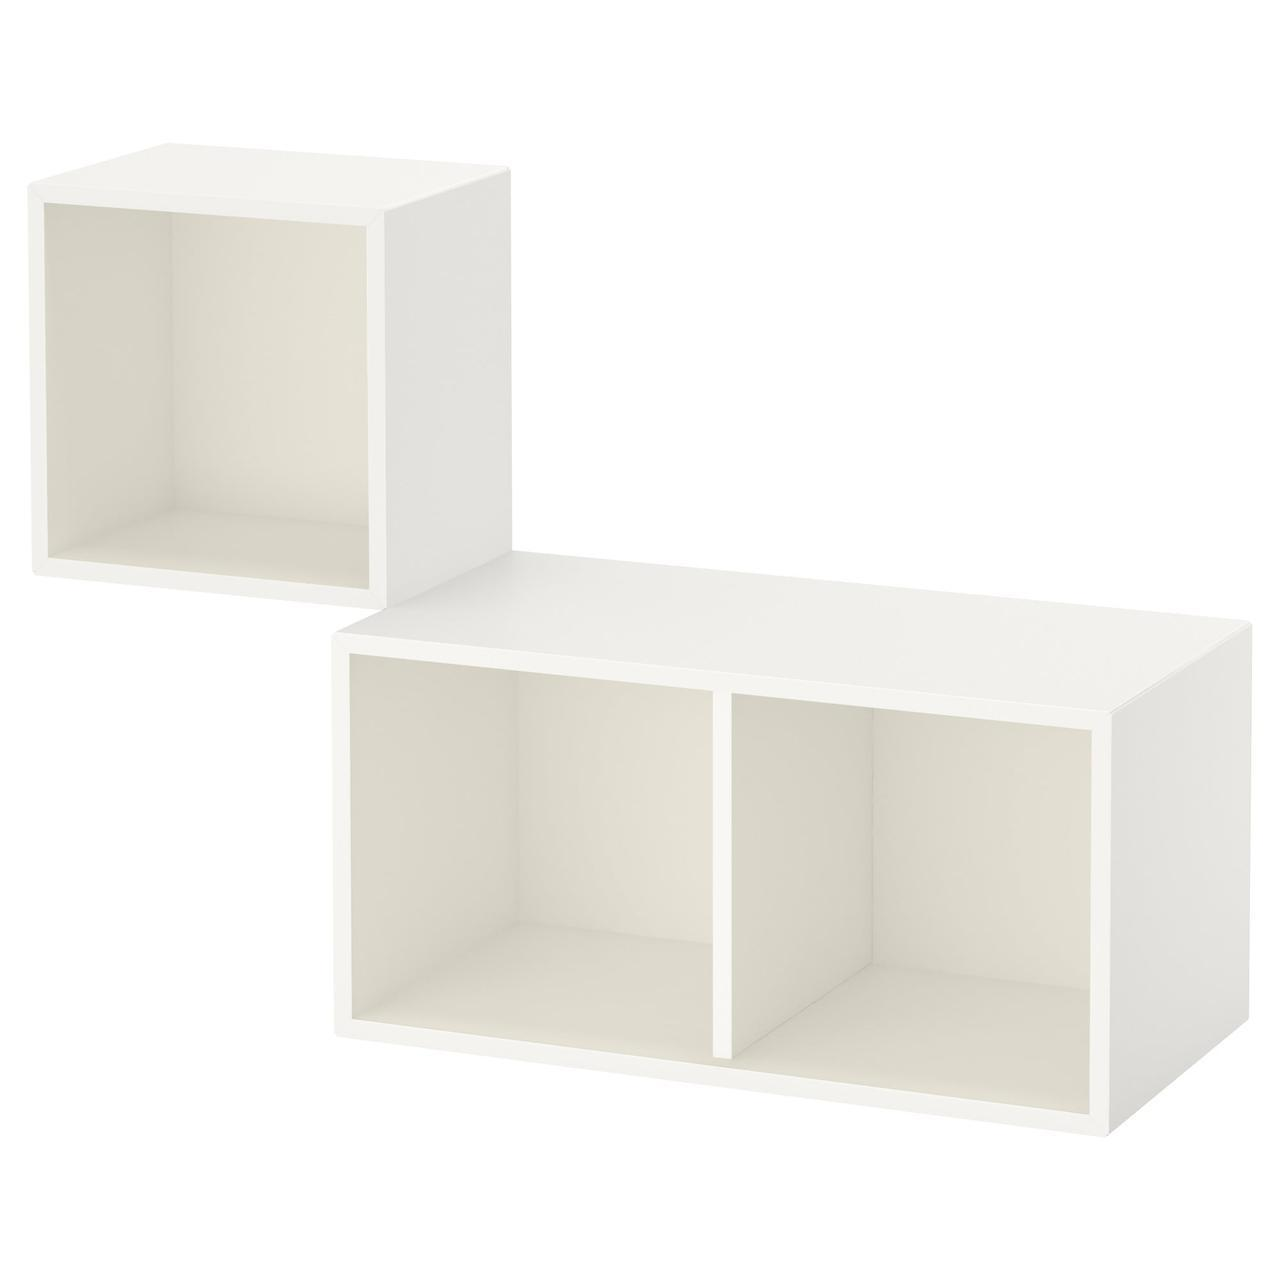 IKEA EKET (391.888.12) Комбинация настенных шкафов, оранжевый